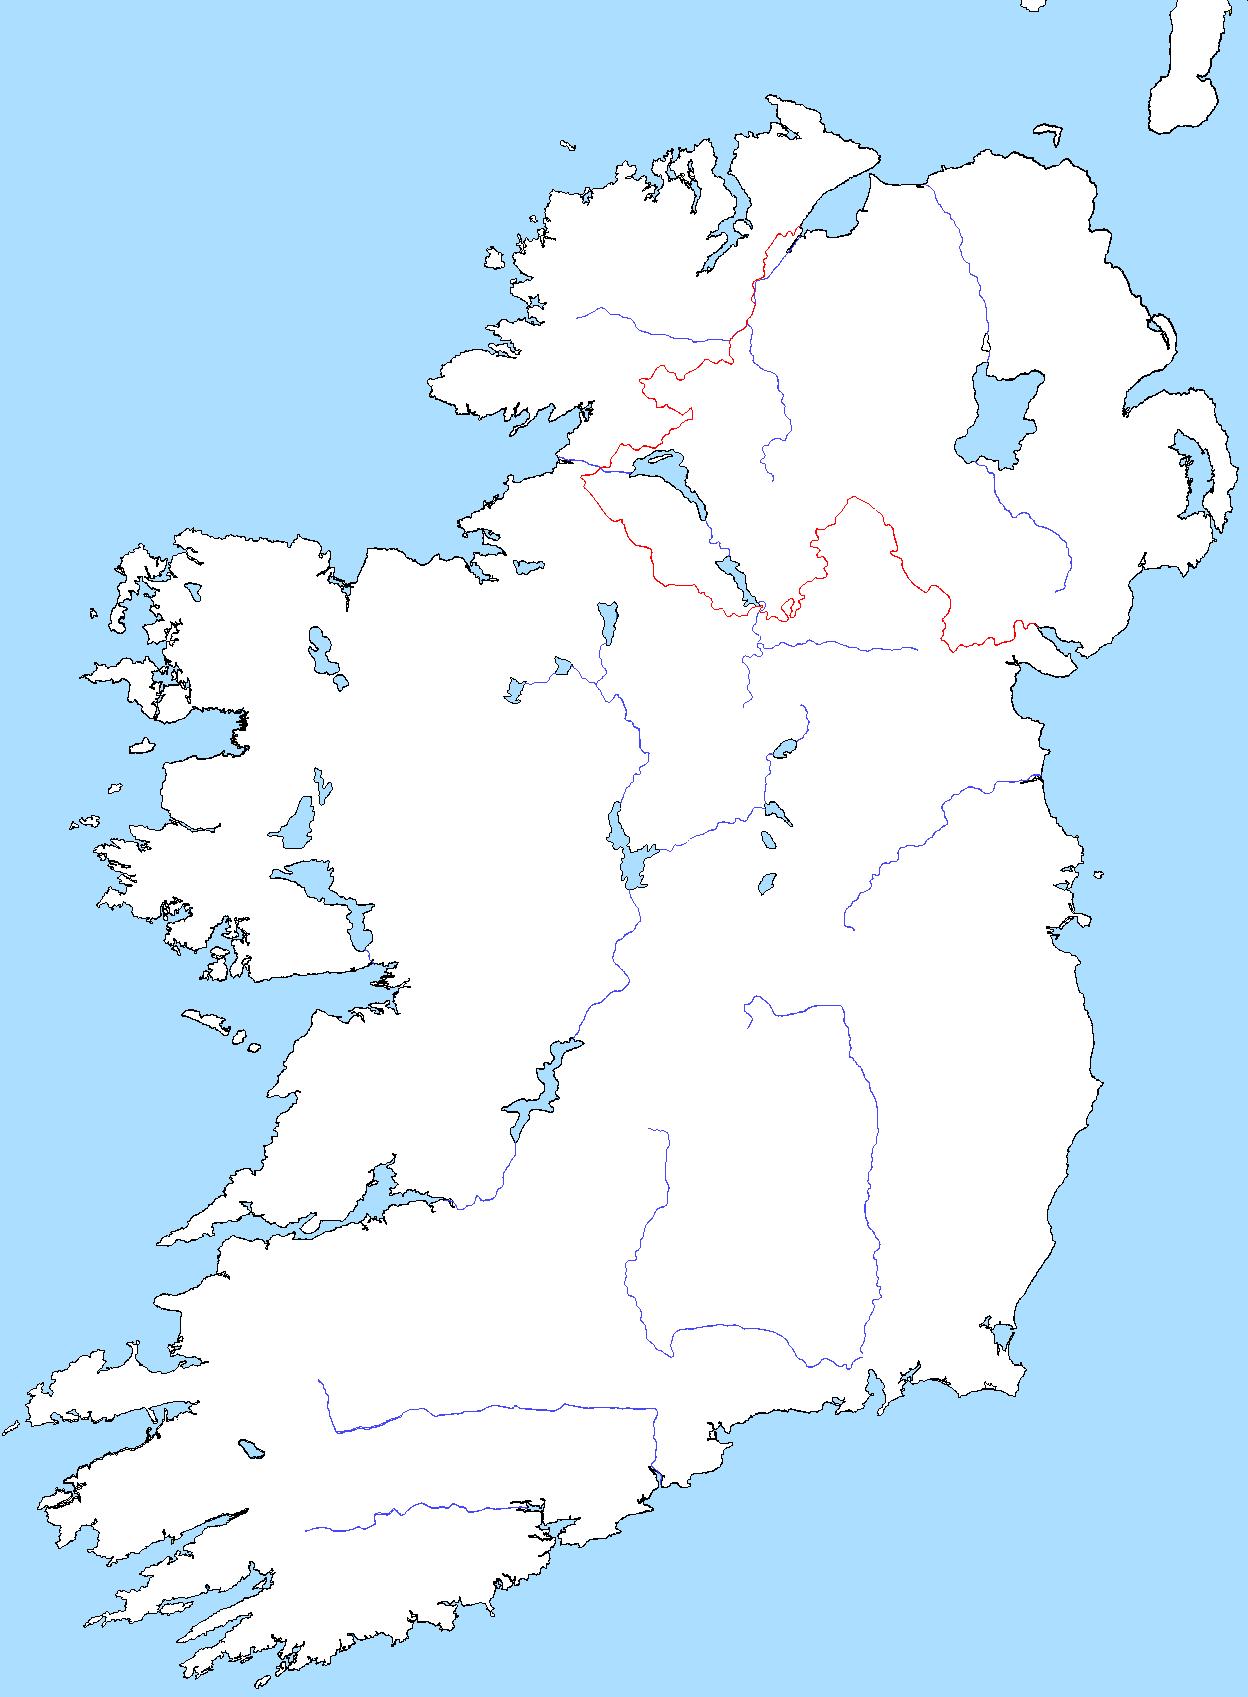 blank_map_directory:western_europe alternatehistory.com wiki